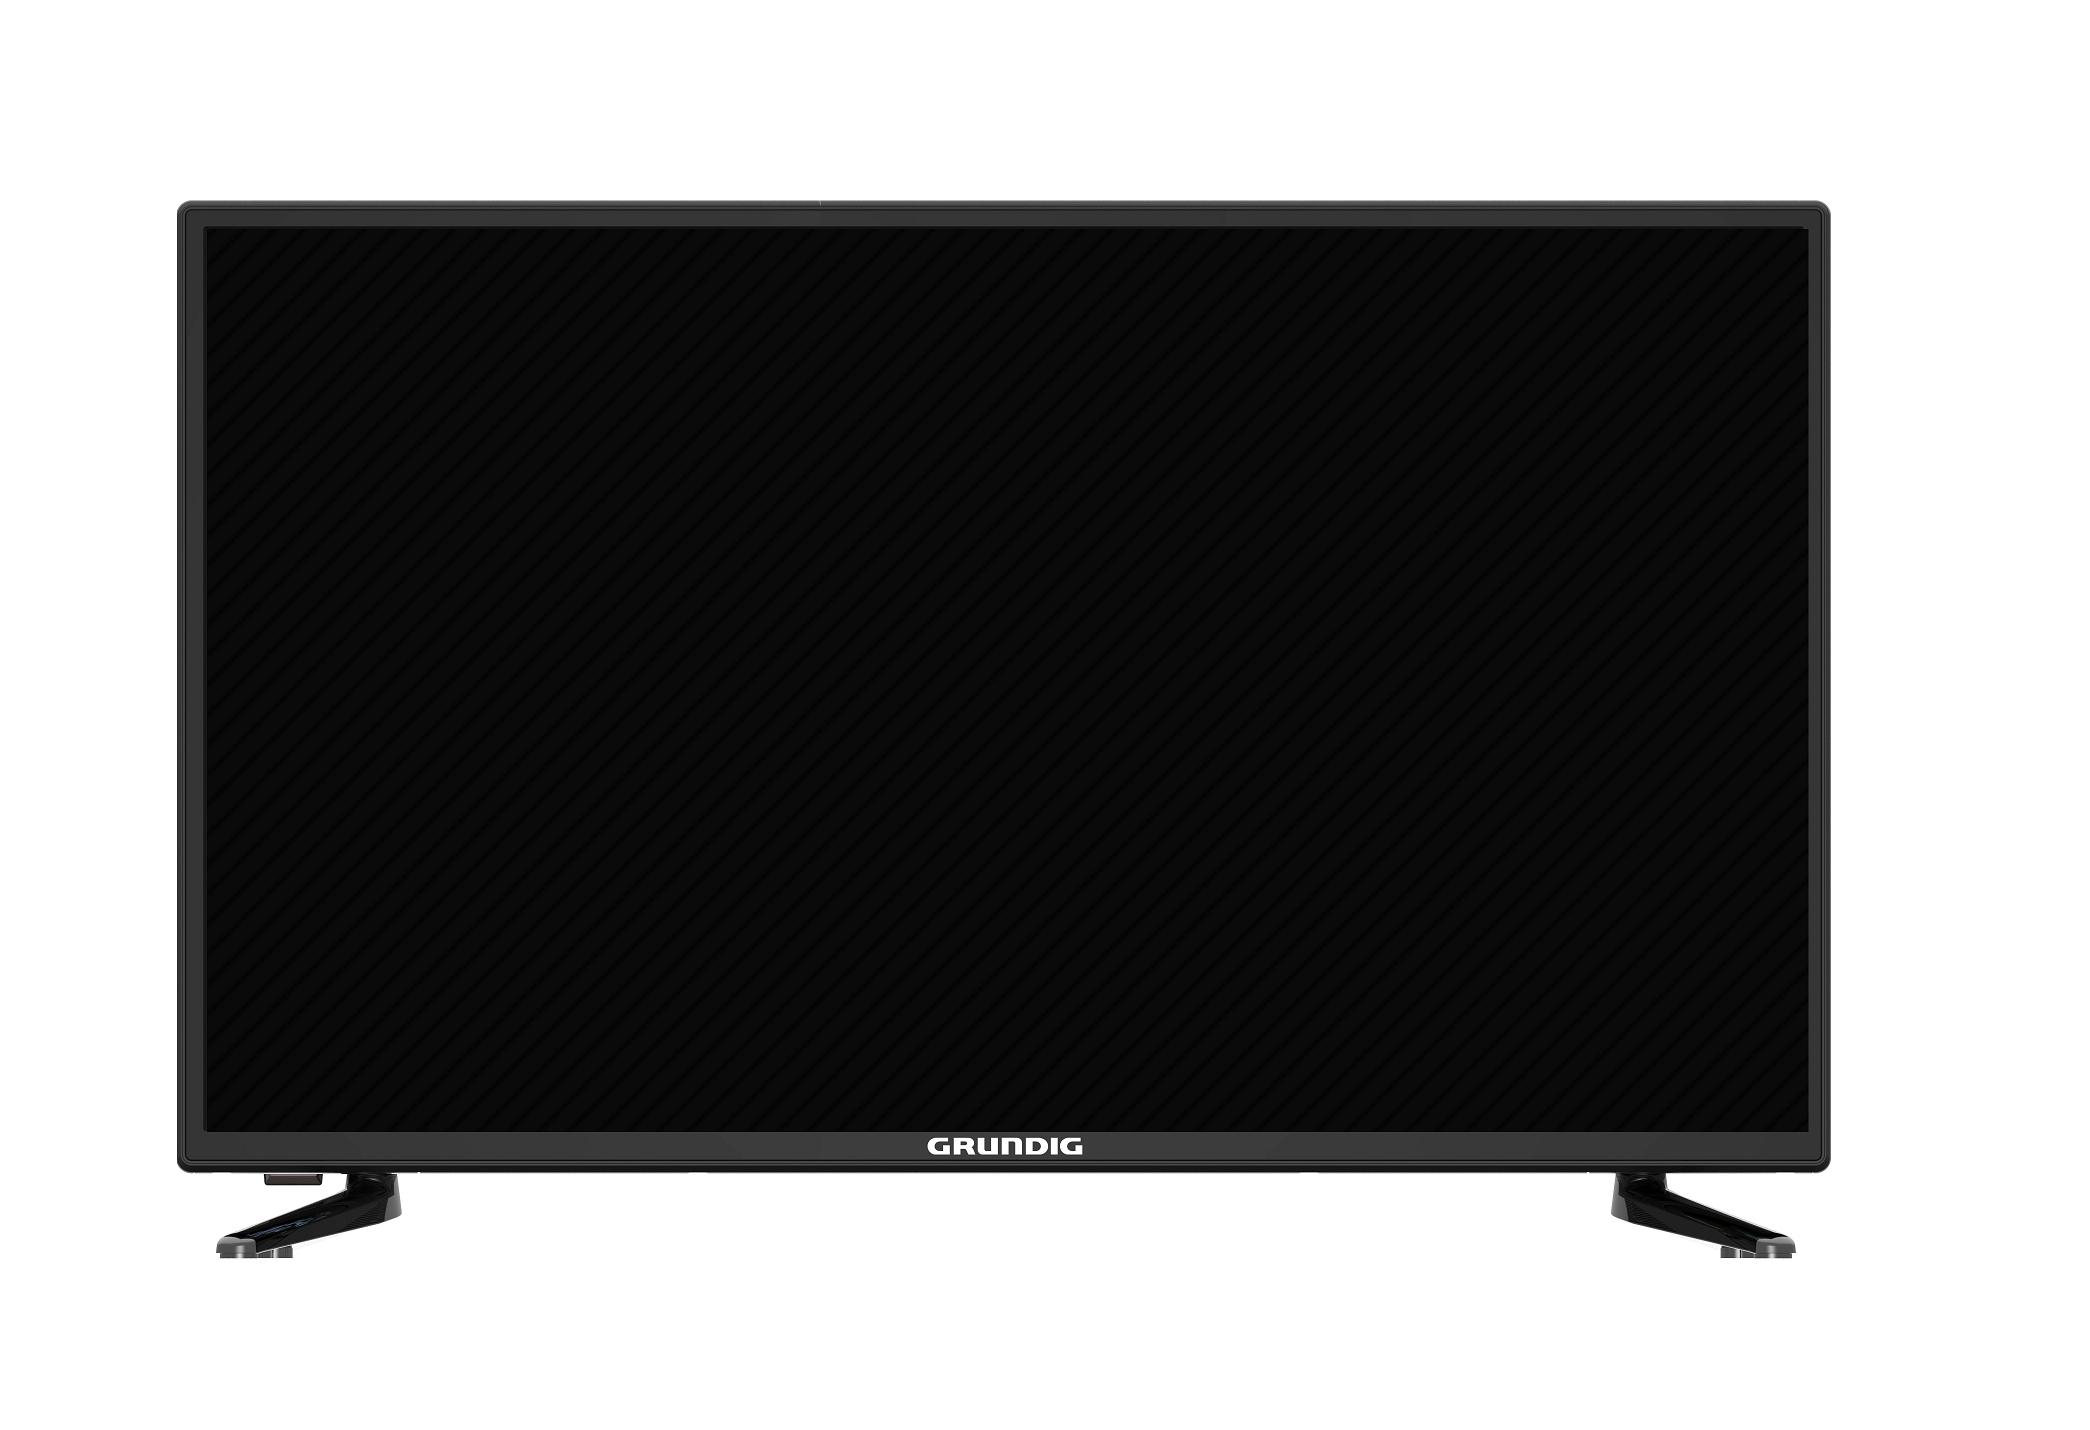 "81 cm (32"") LCD/TFT Monitor"